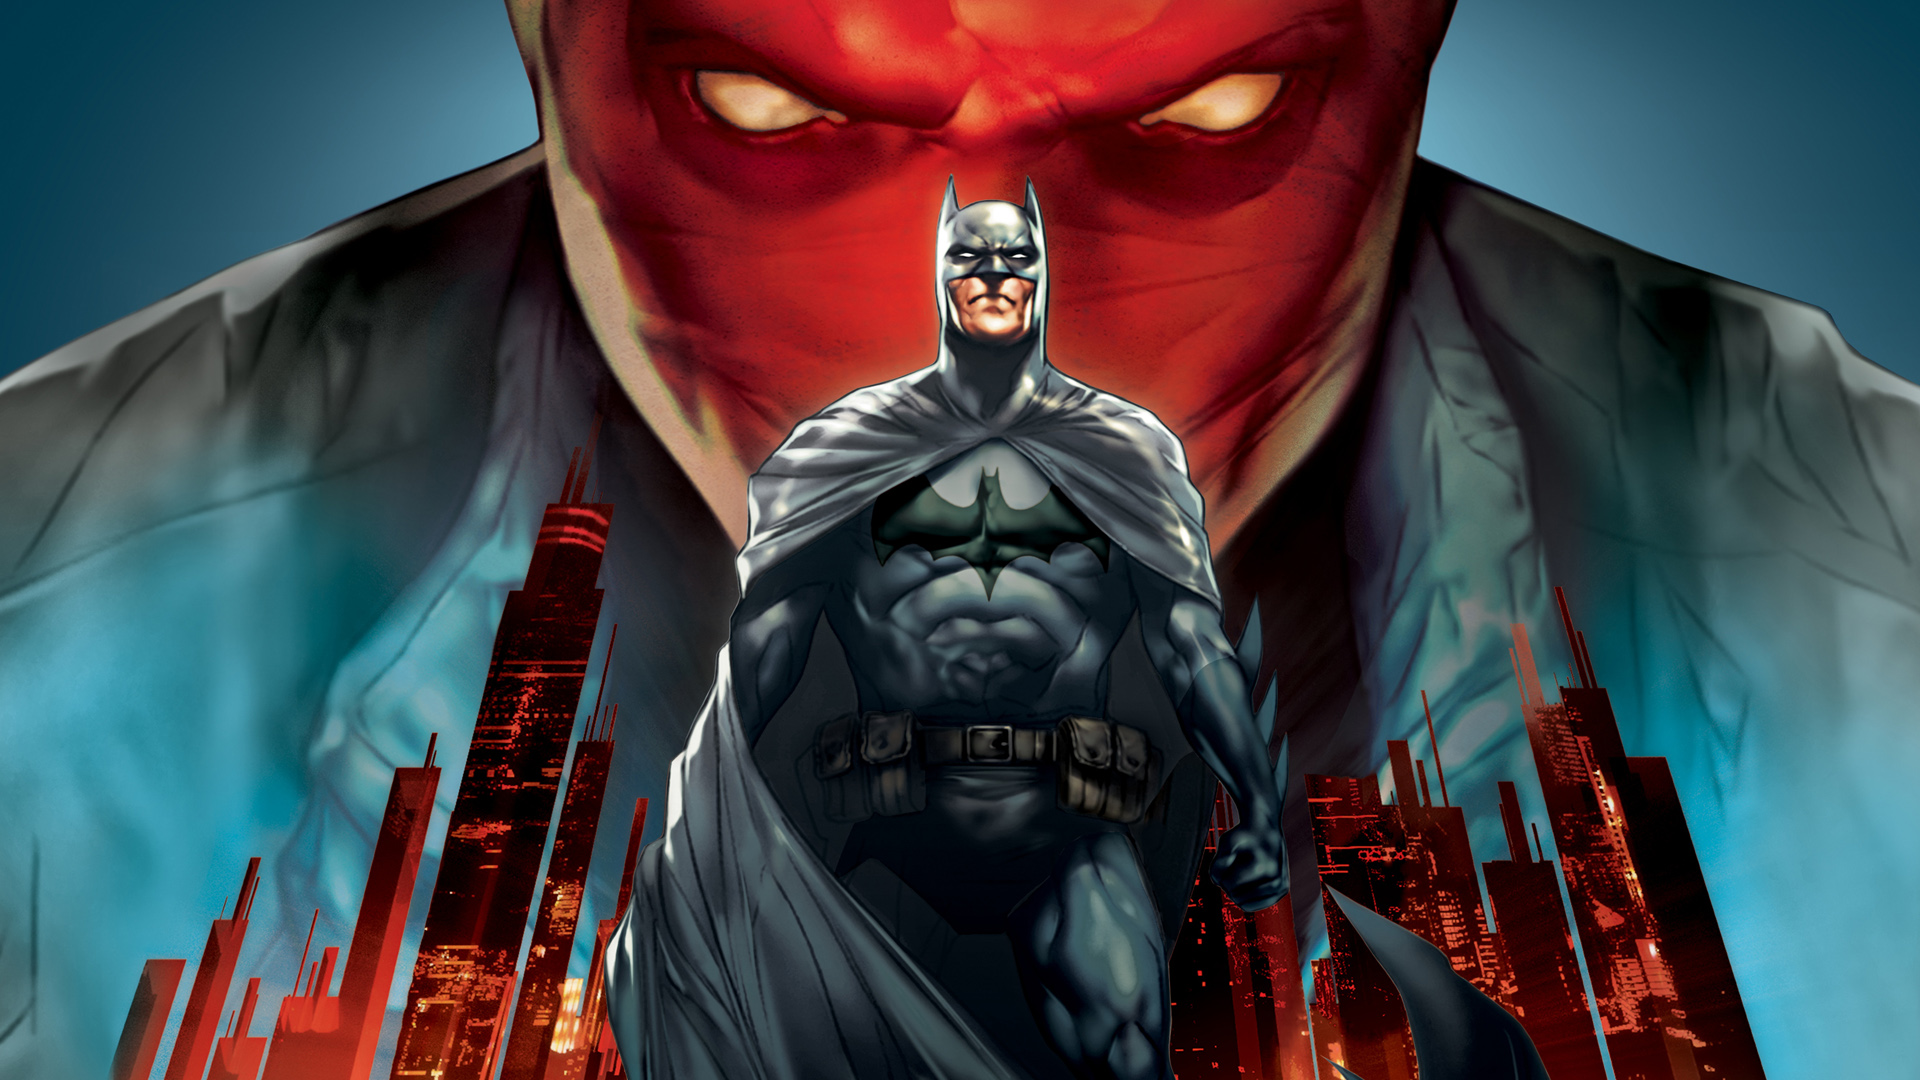 Batman: Arkham Knight. Devět teorii: Kdo je Arkham Knight? 10408